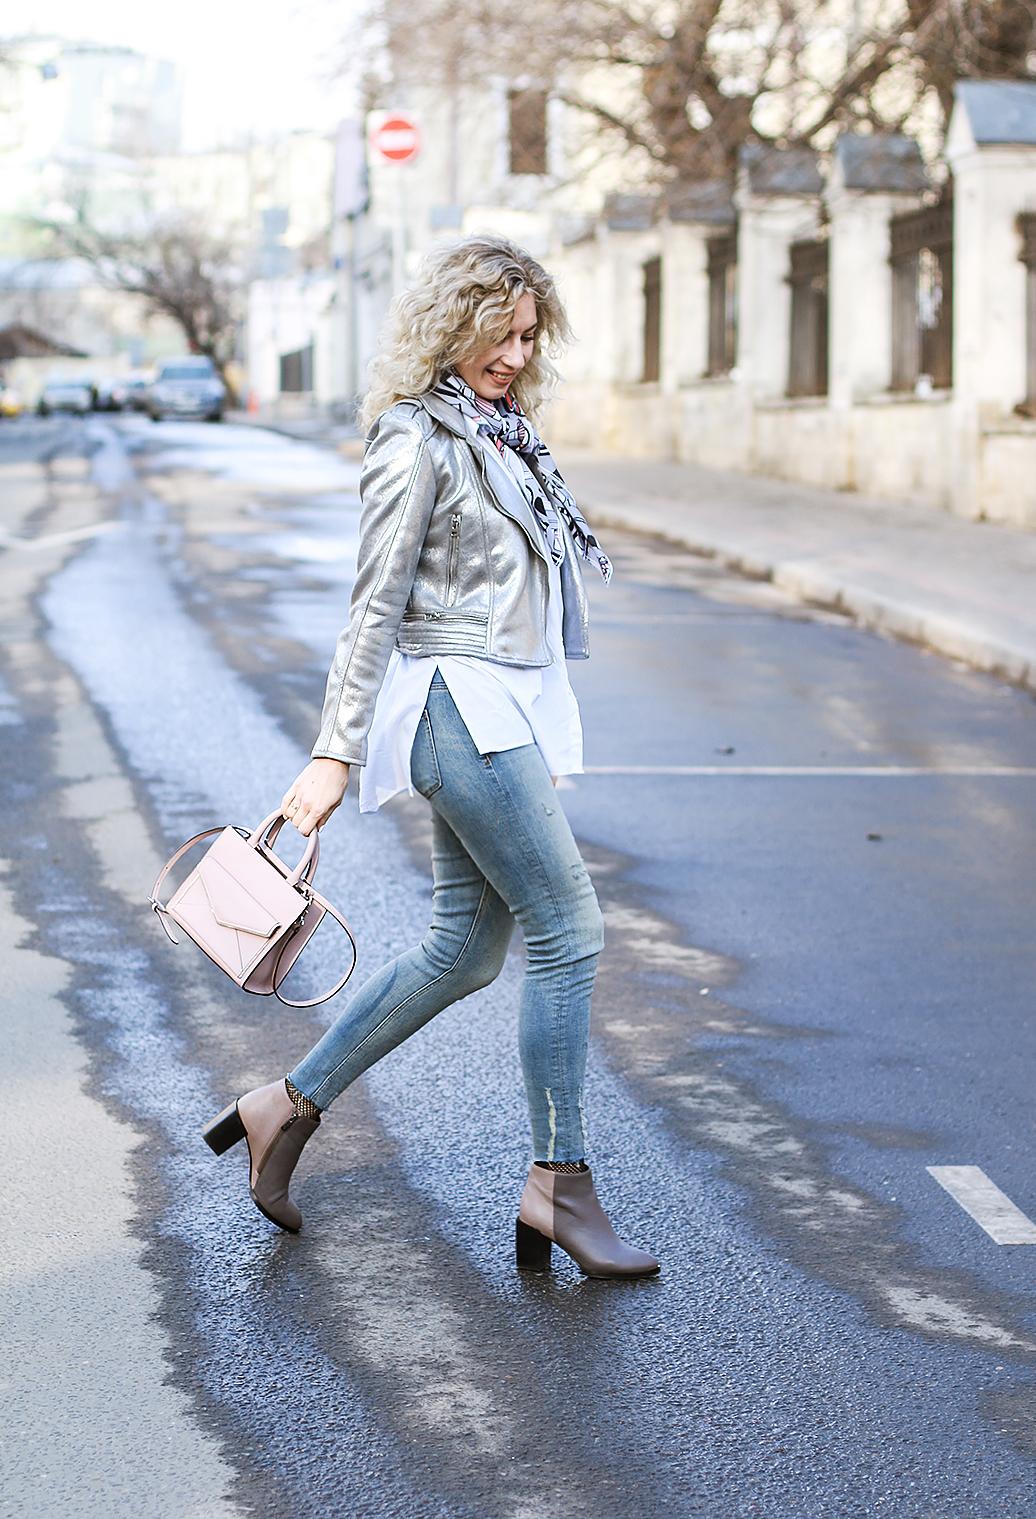 Margarita_Maslova_Ritalifestyle_Fashion_blogger_Moscow_silver_jacket_metallic_trend_FISHNET_spring_looks